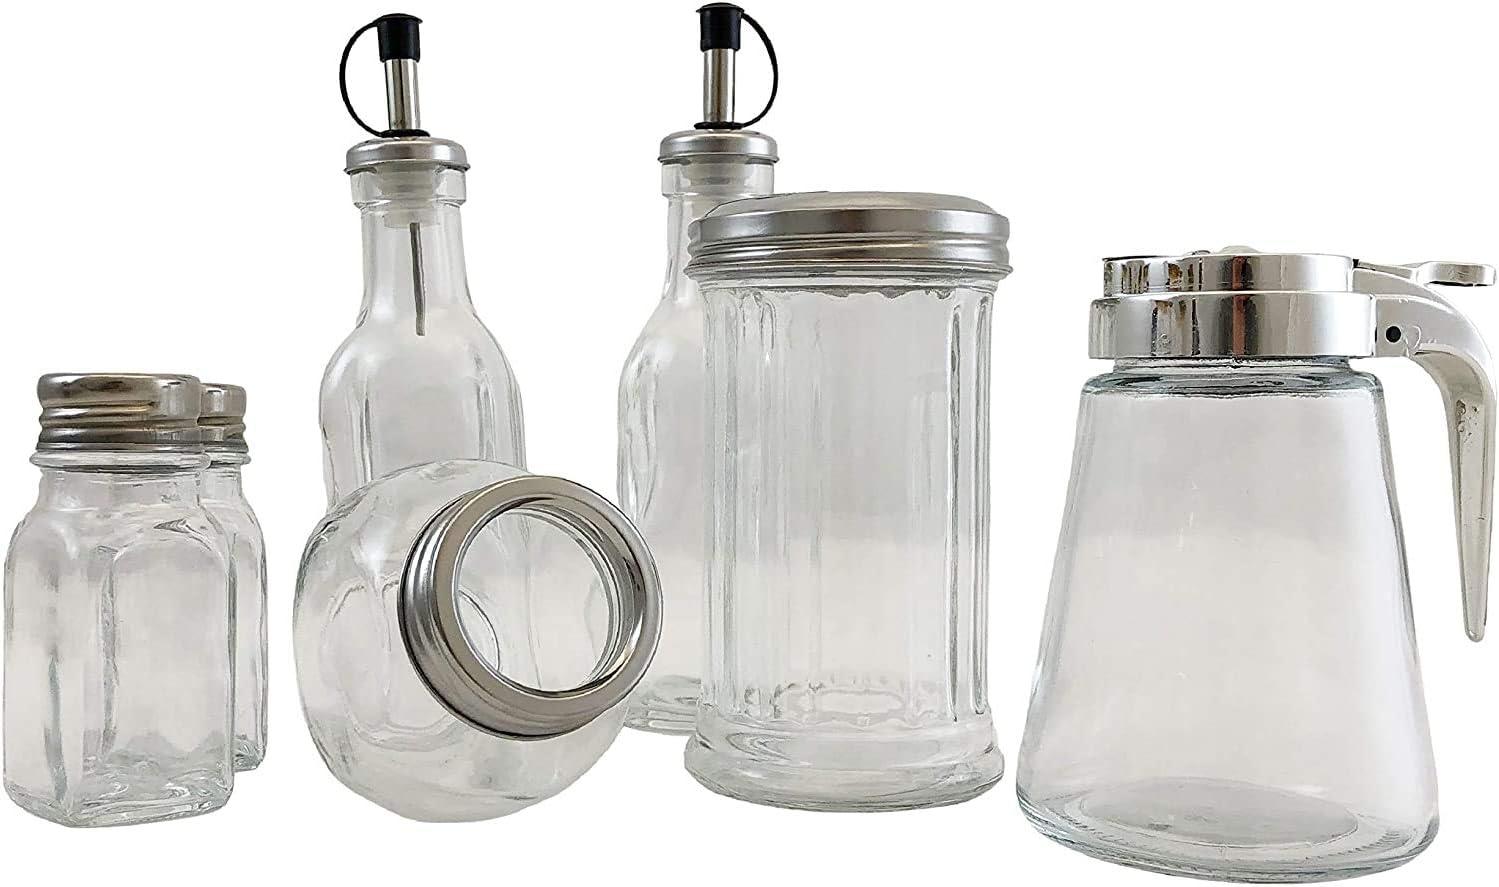 Sugar Dispenser /& Syrup Jar Spice Jar 7 Piece Durable Condiment Set Glass Bodies with Stainless Steel Tops Oil /& Vinegar Cruet Salt /& Pepper Shaker